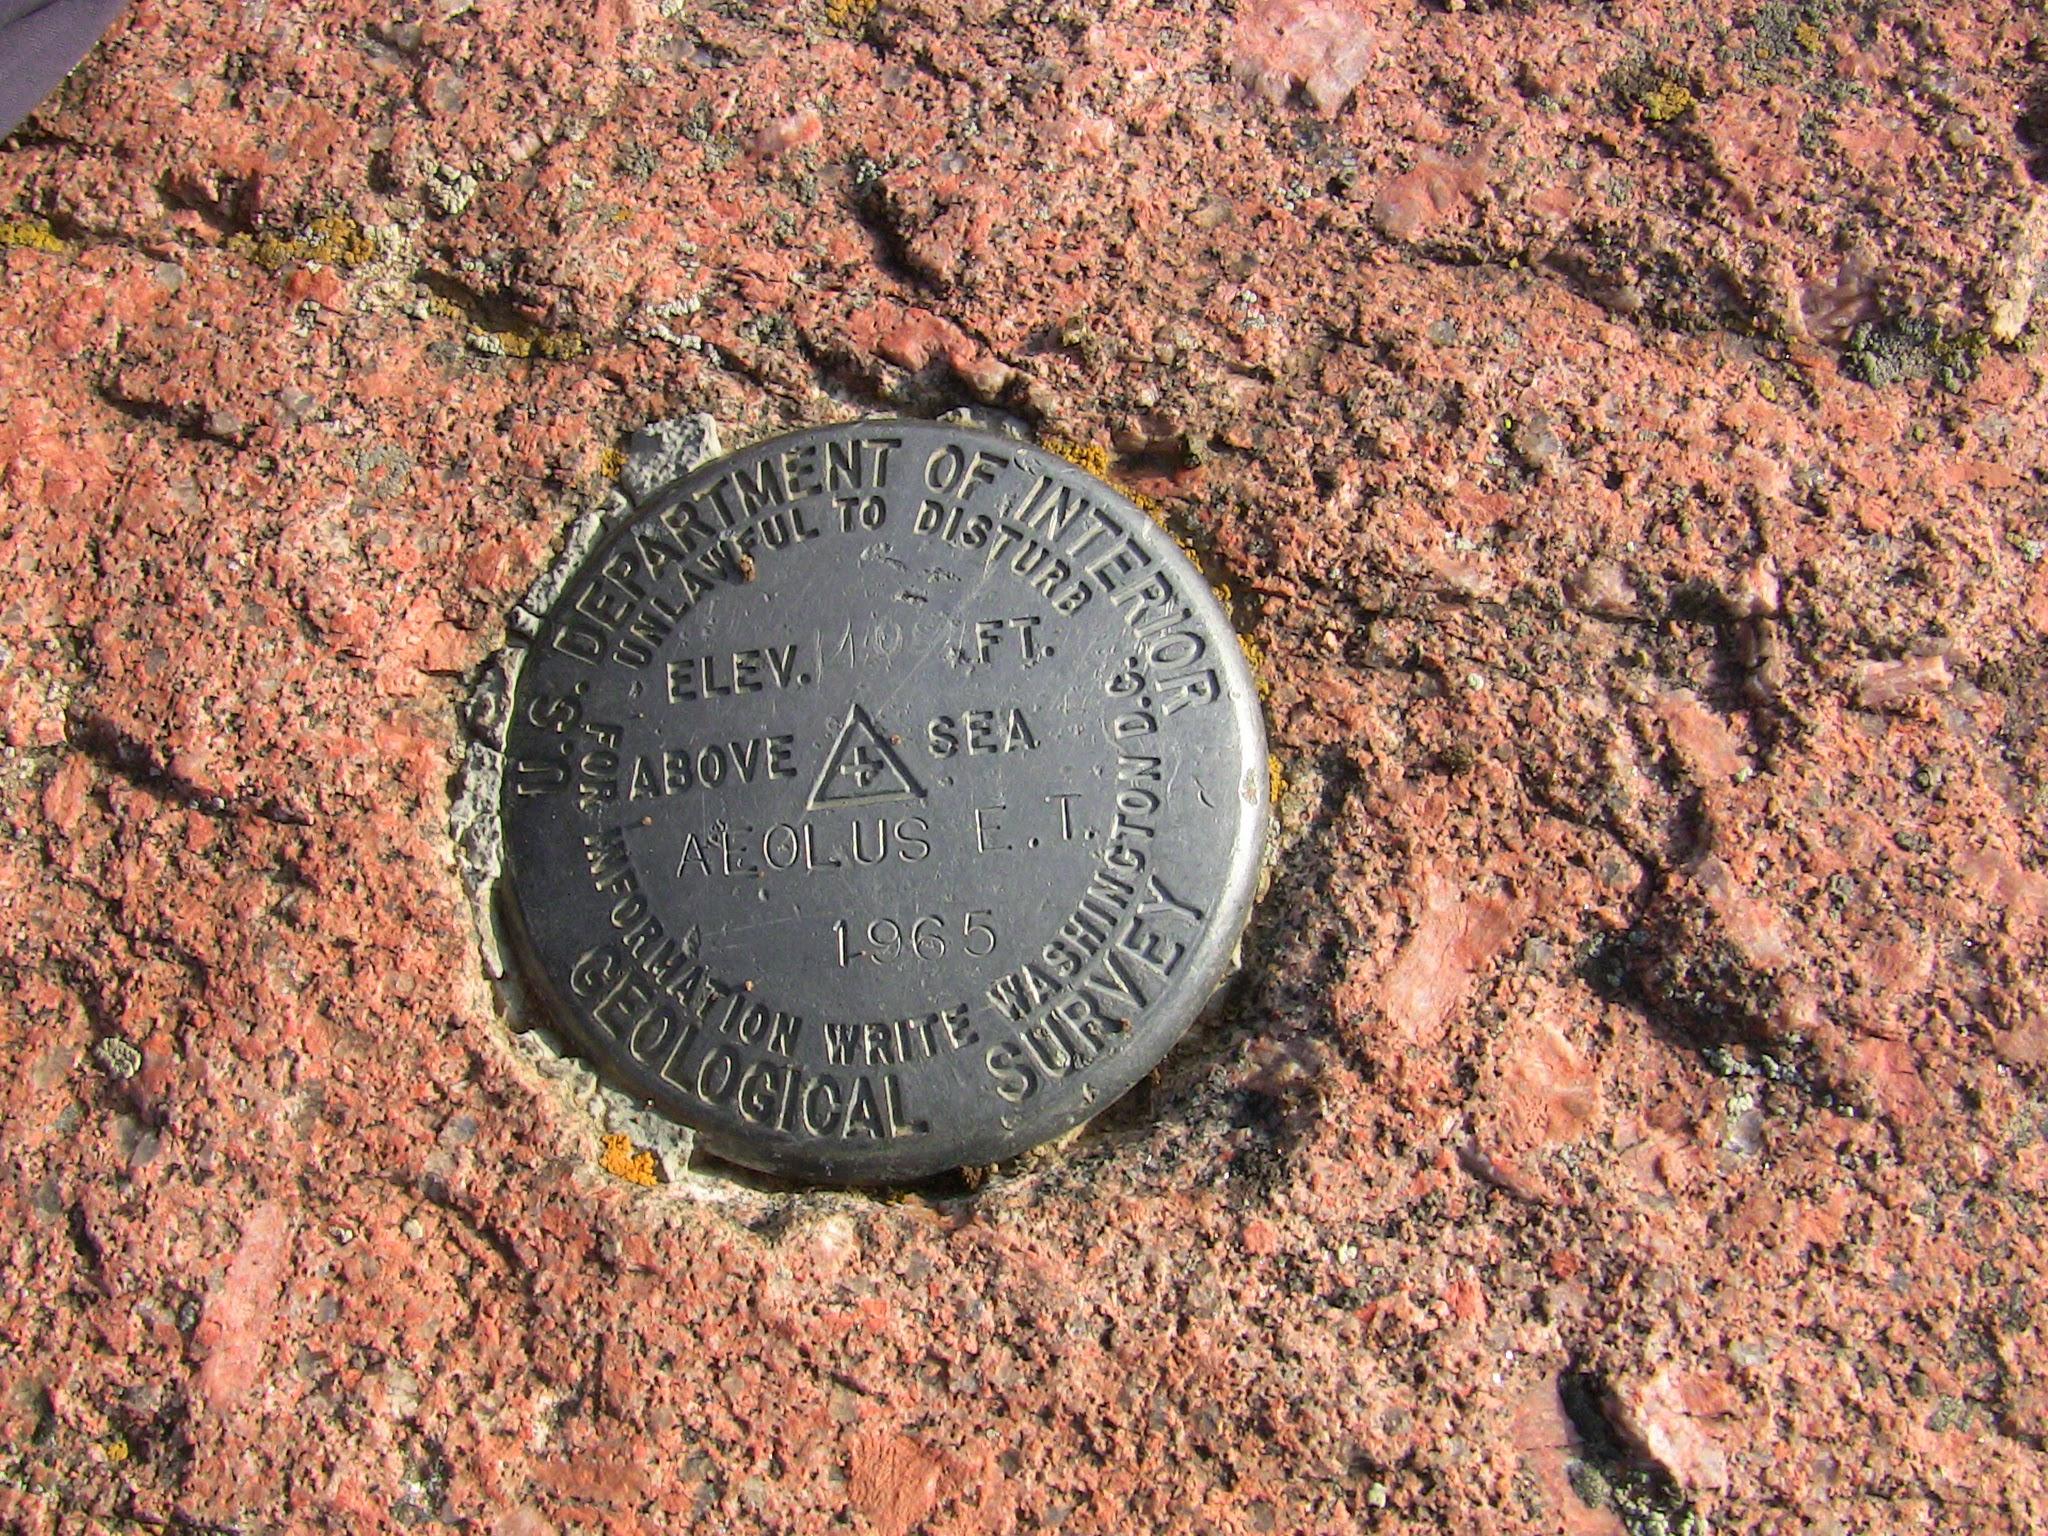 Eolus Geomarker